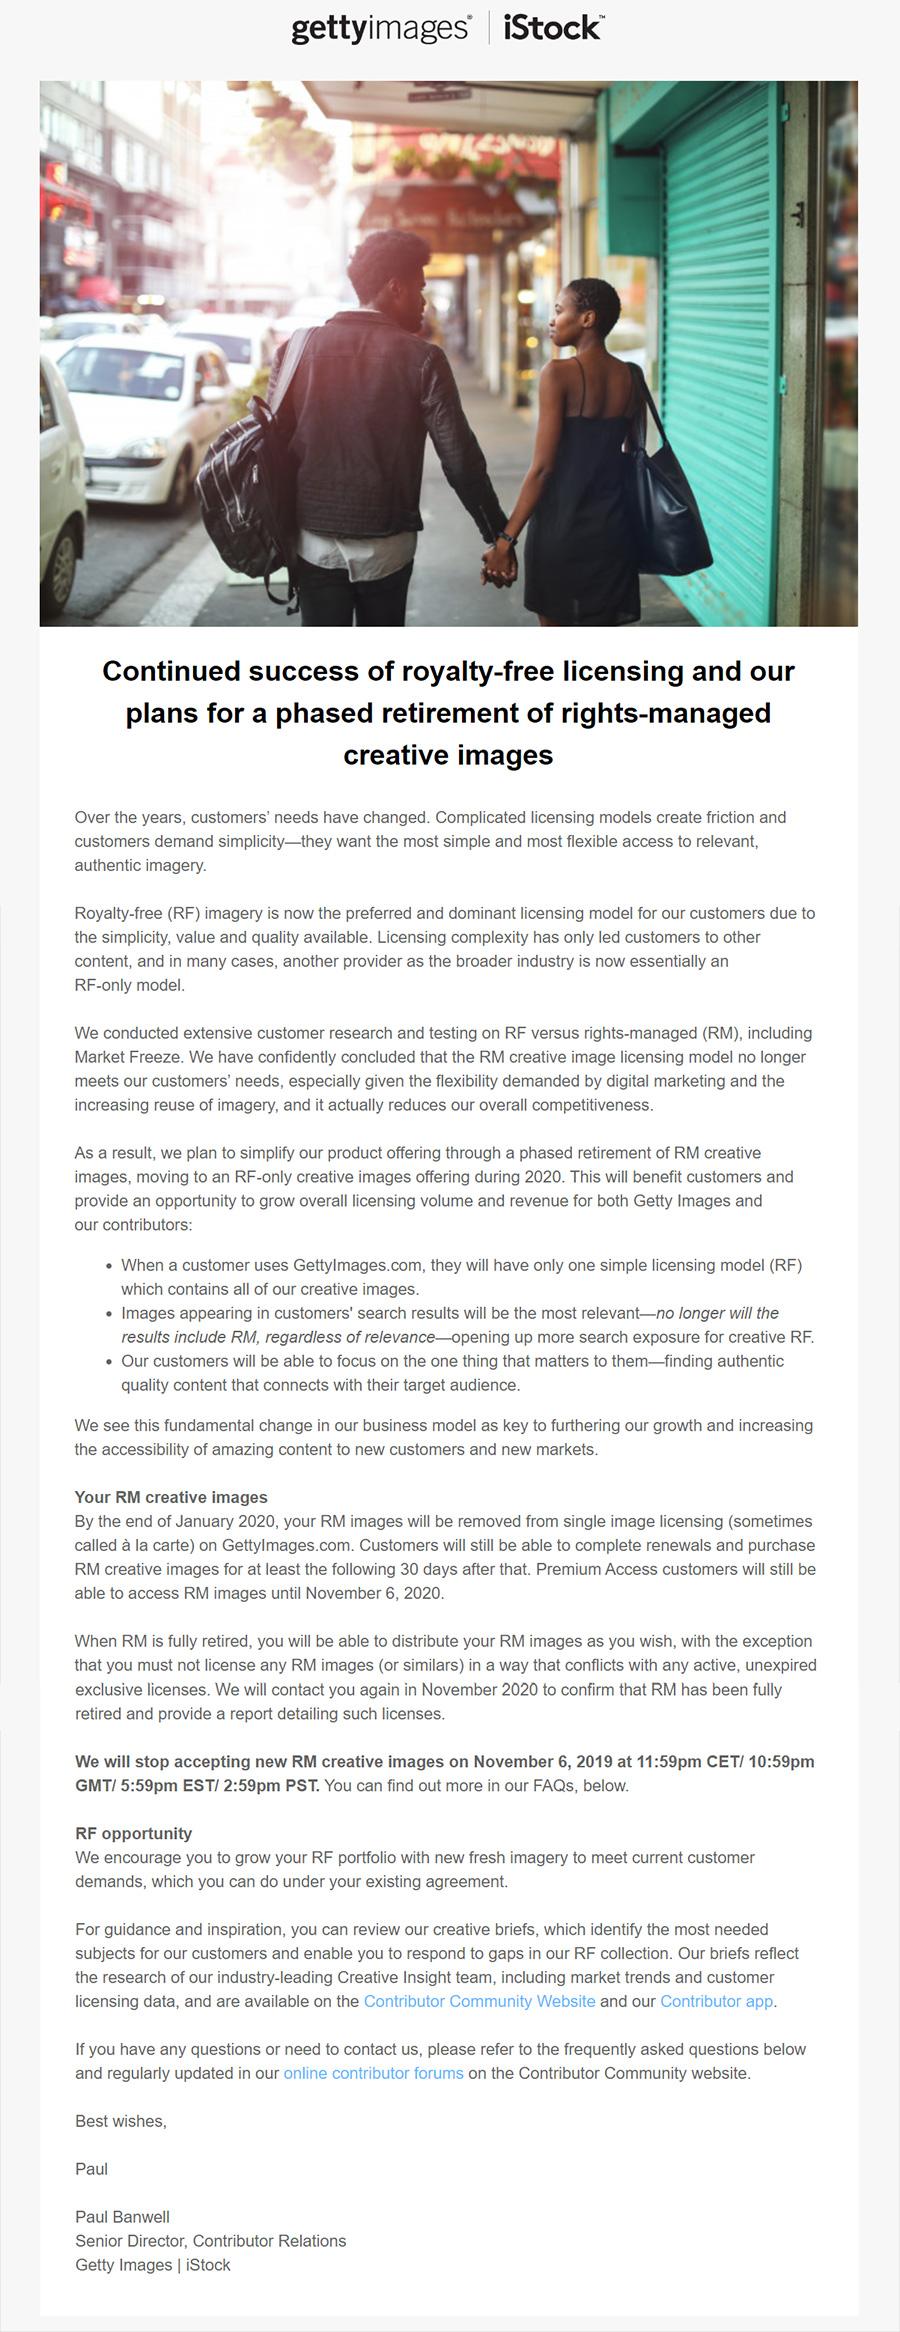 HOT! Getty Images закрывает Rights-Managed (RM) направление. Конец эпохи.